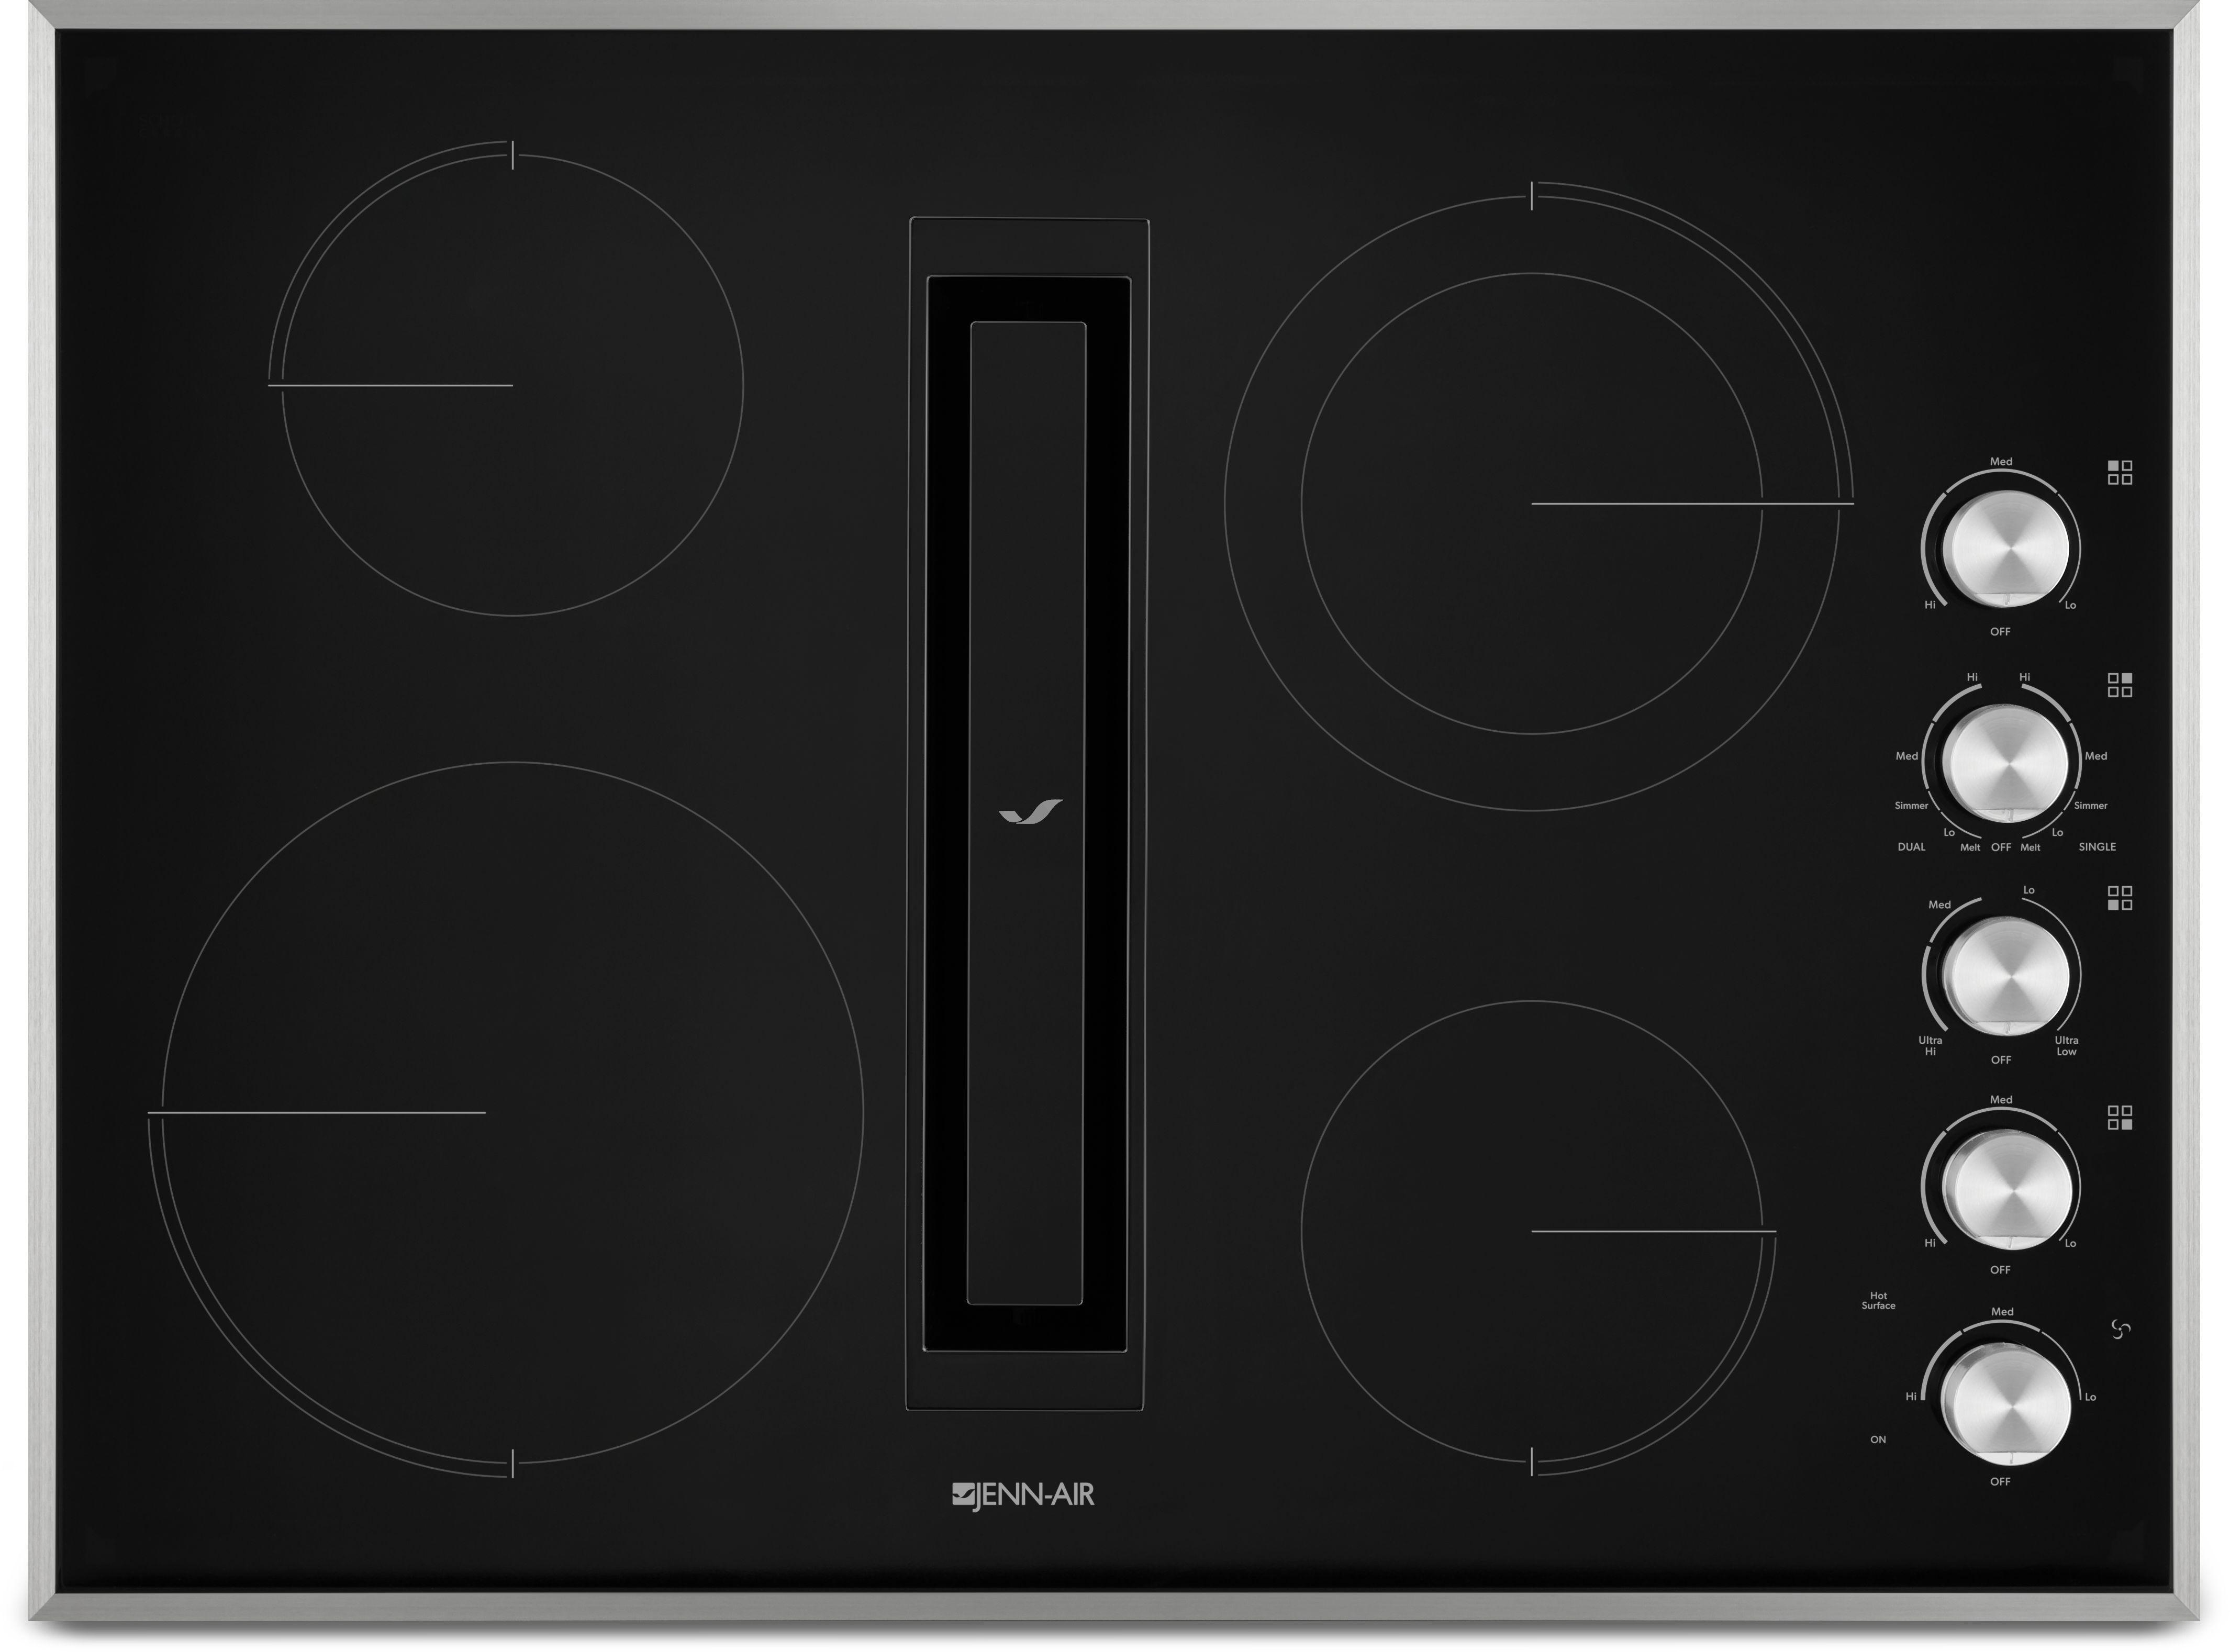 "Jenn Air 30"" Electric Downdraft Cooktop JED3430G Appliances"